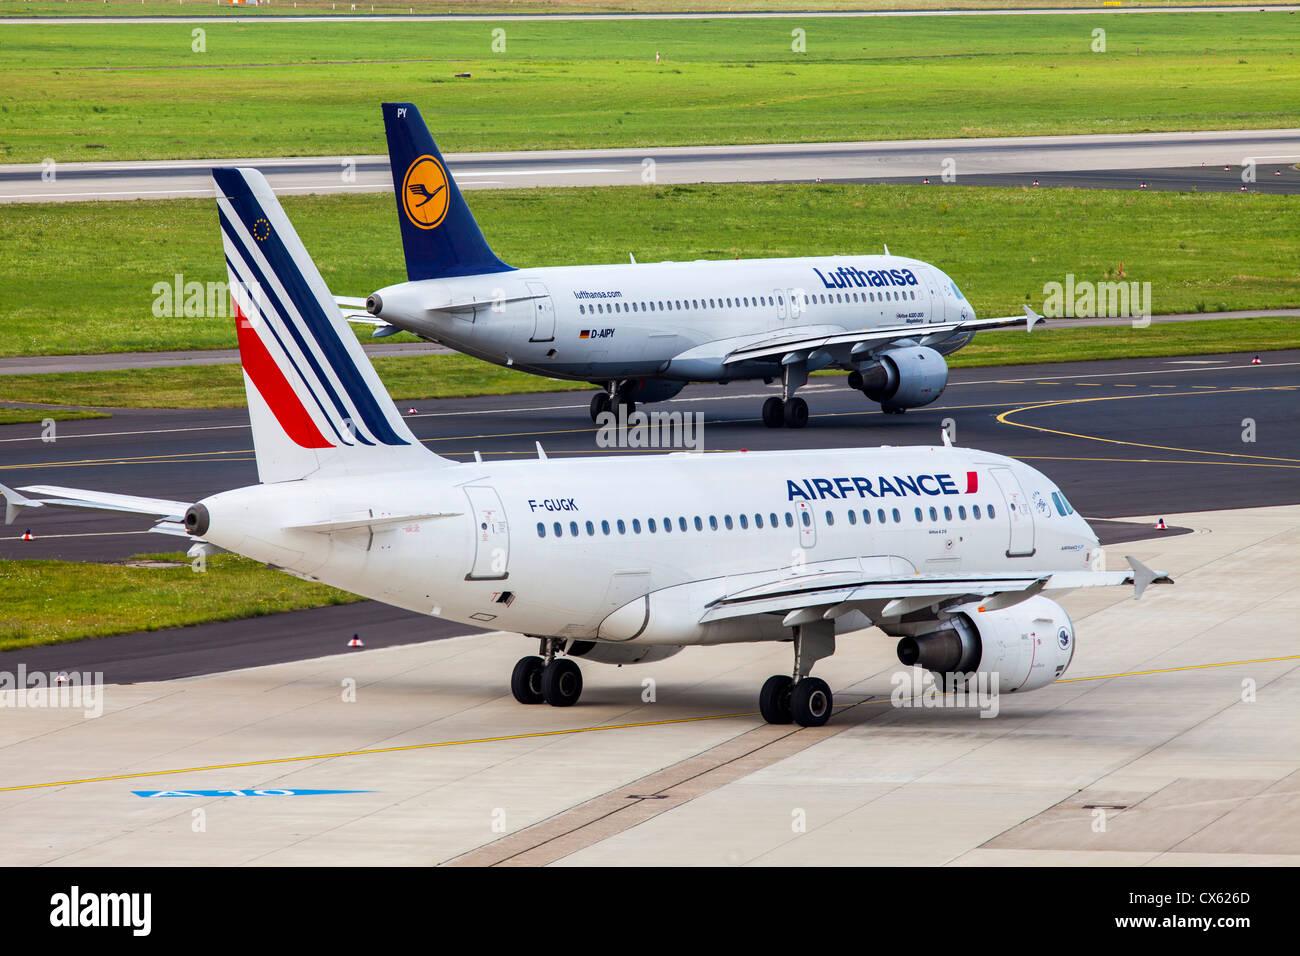 Air planes at Düsseldorf International Airport. Germany, Europe. - Stock Image